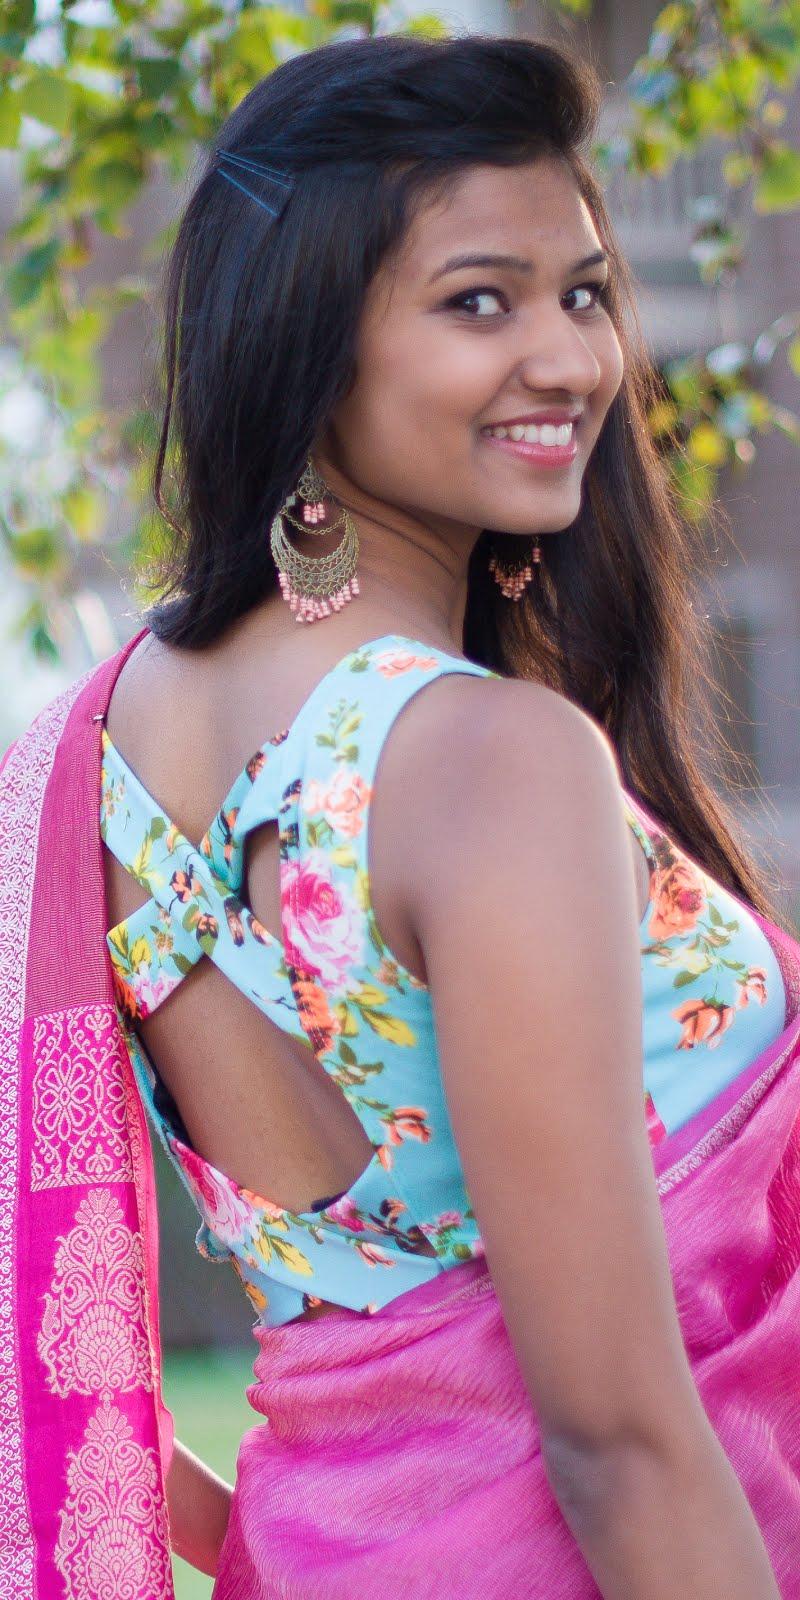 seamless pink floral pattern